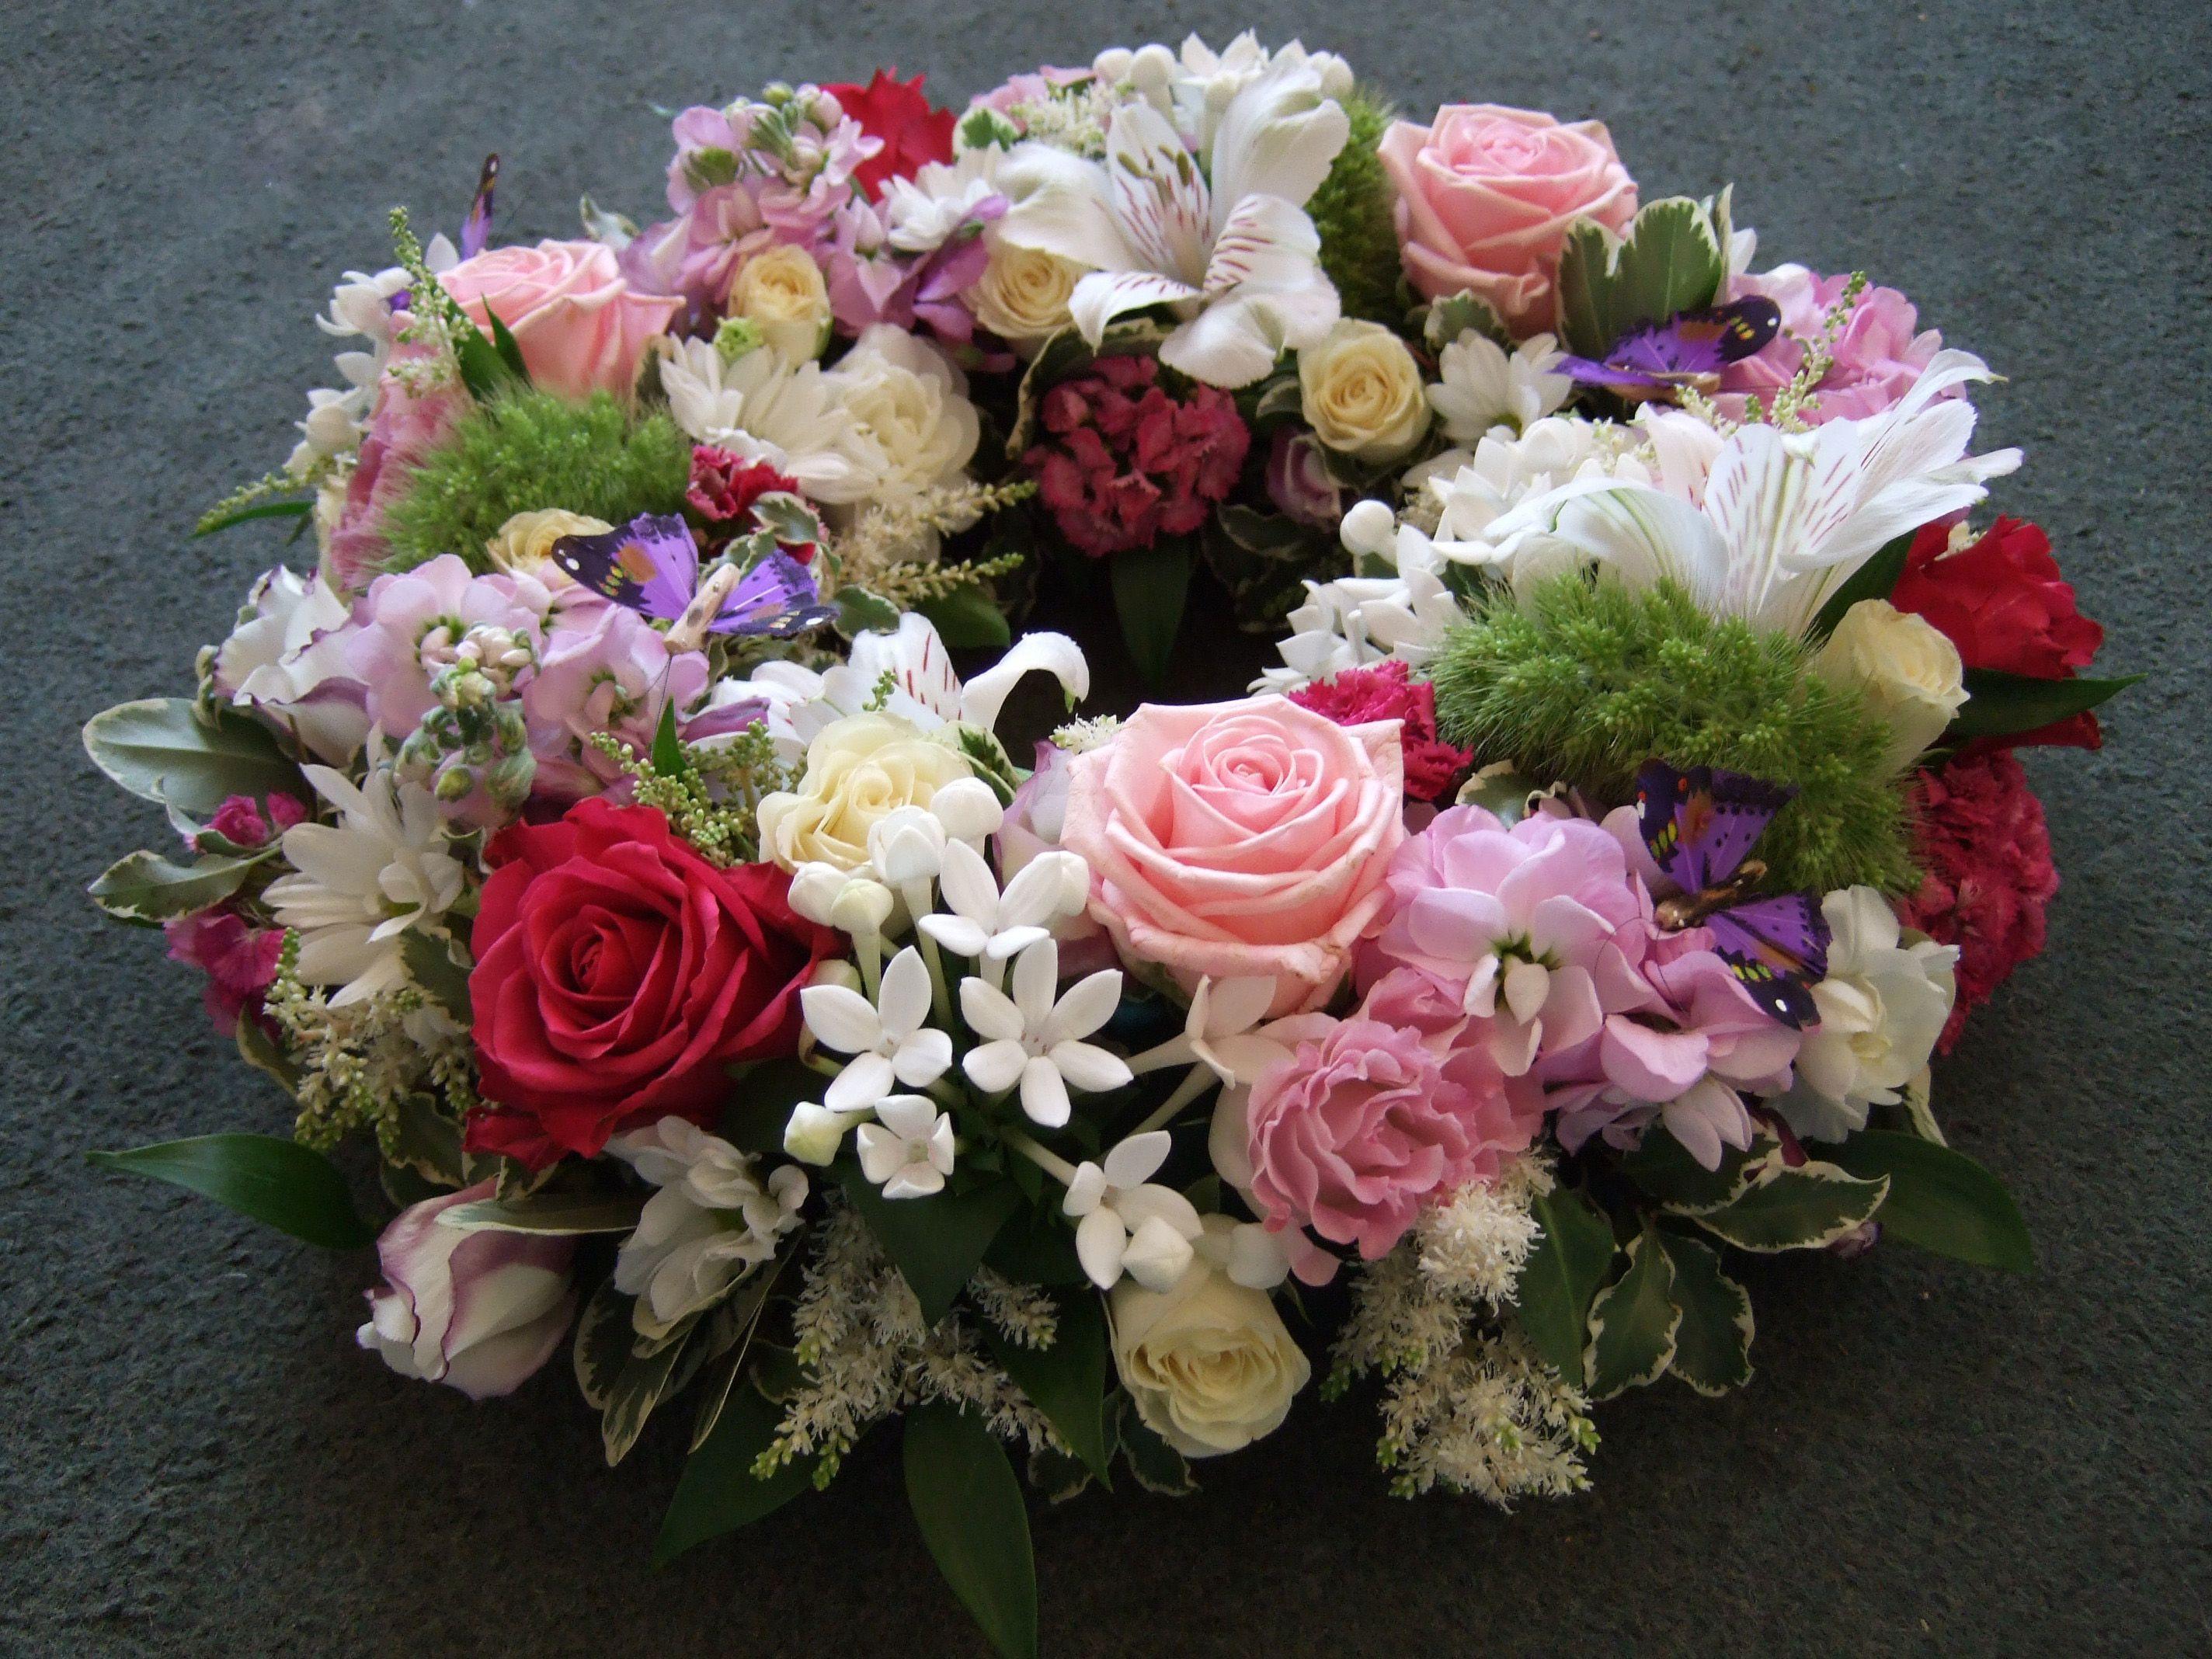 mixed flowers wreath with roses Lisianthus stocks and bouvardia